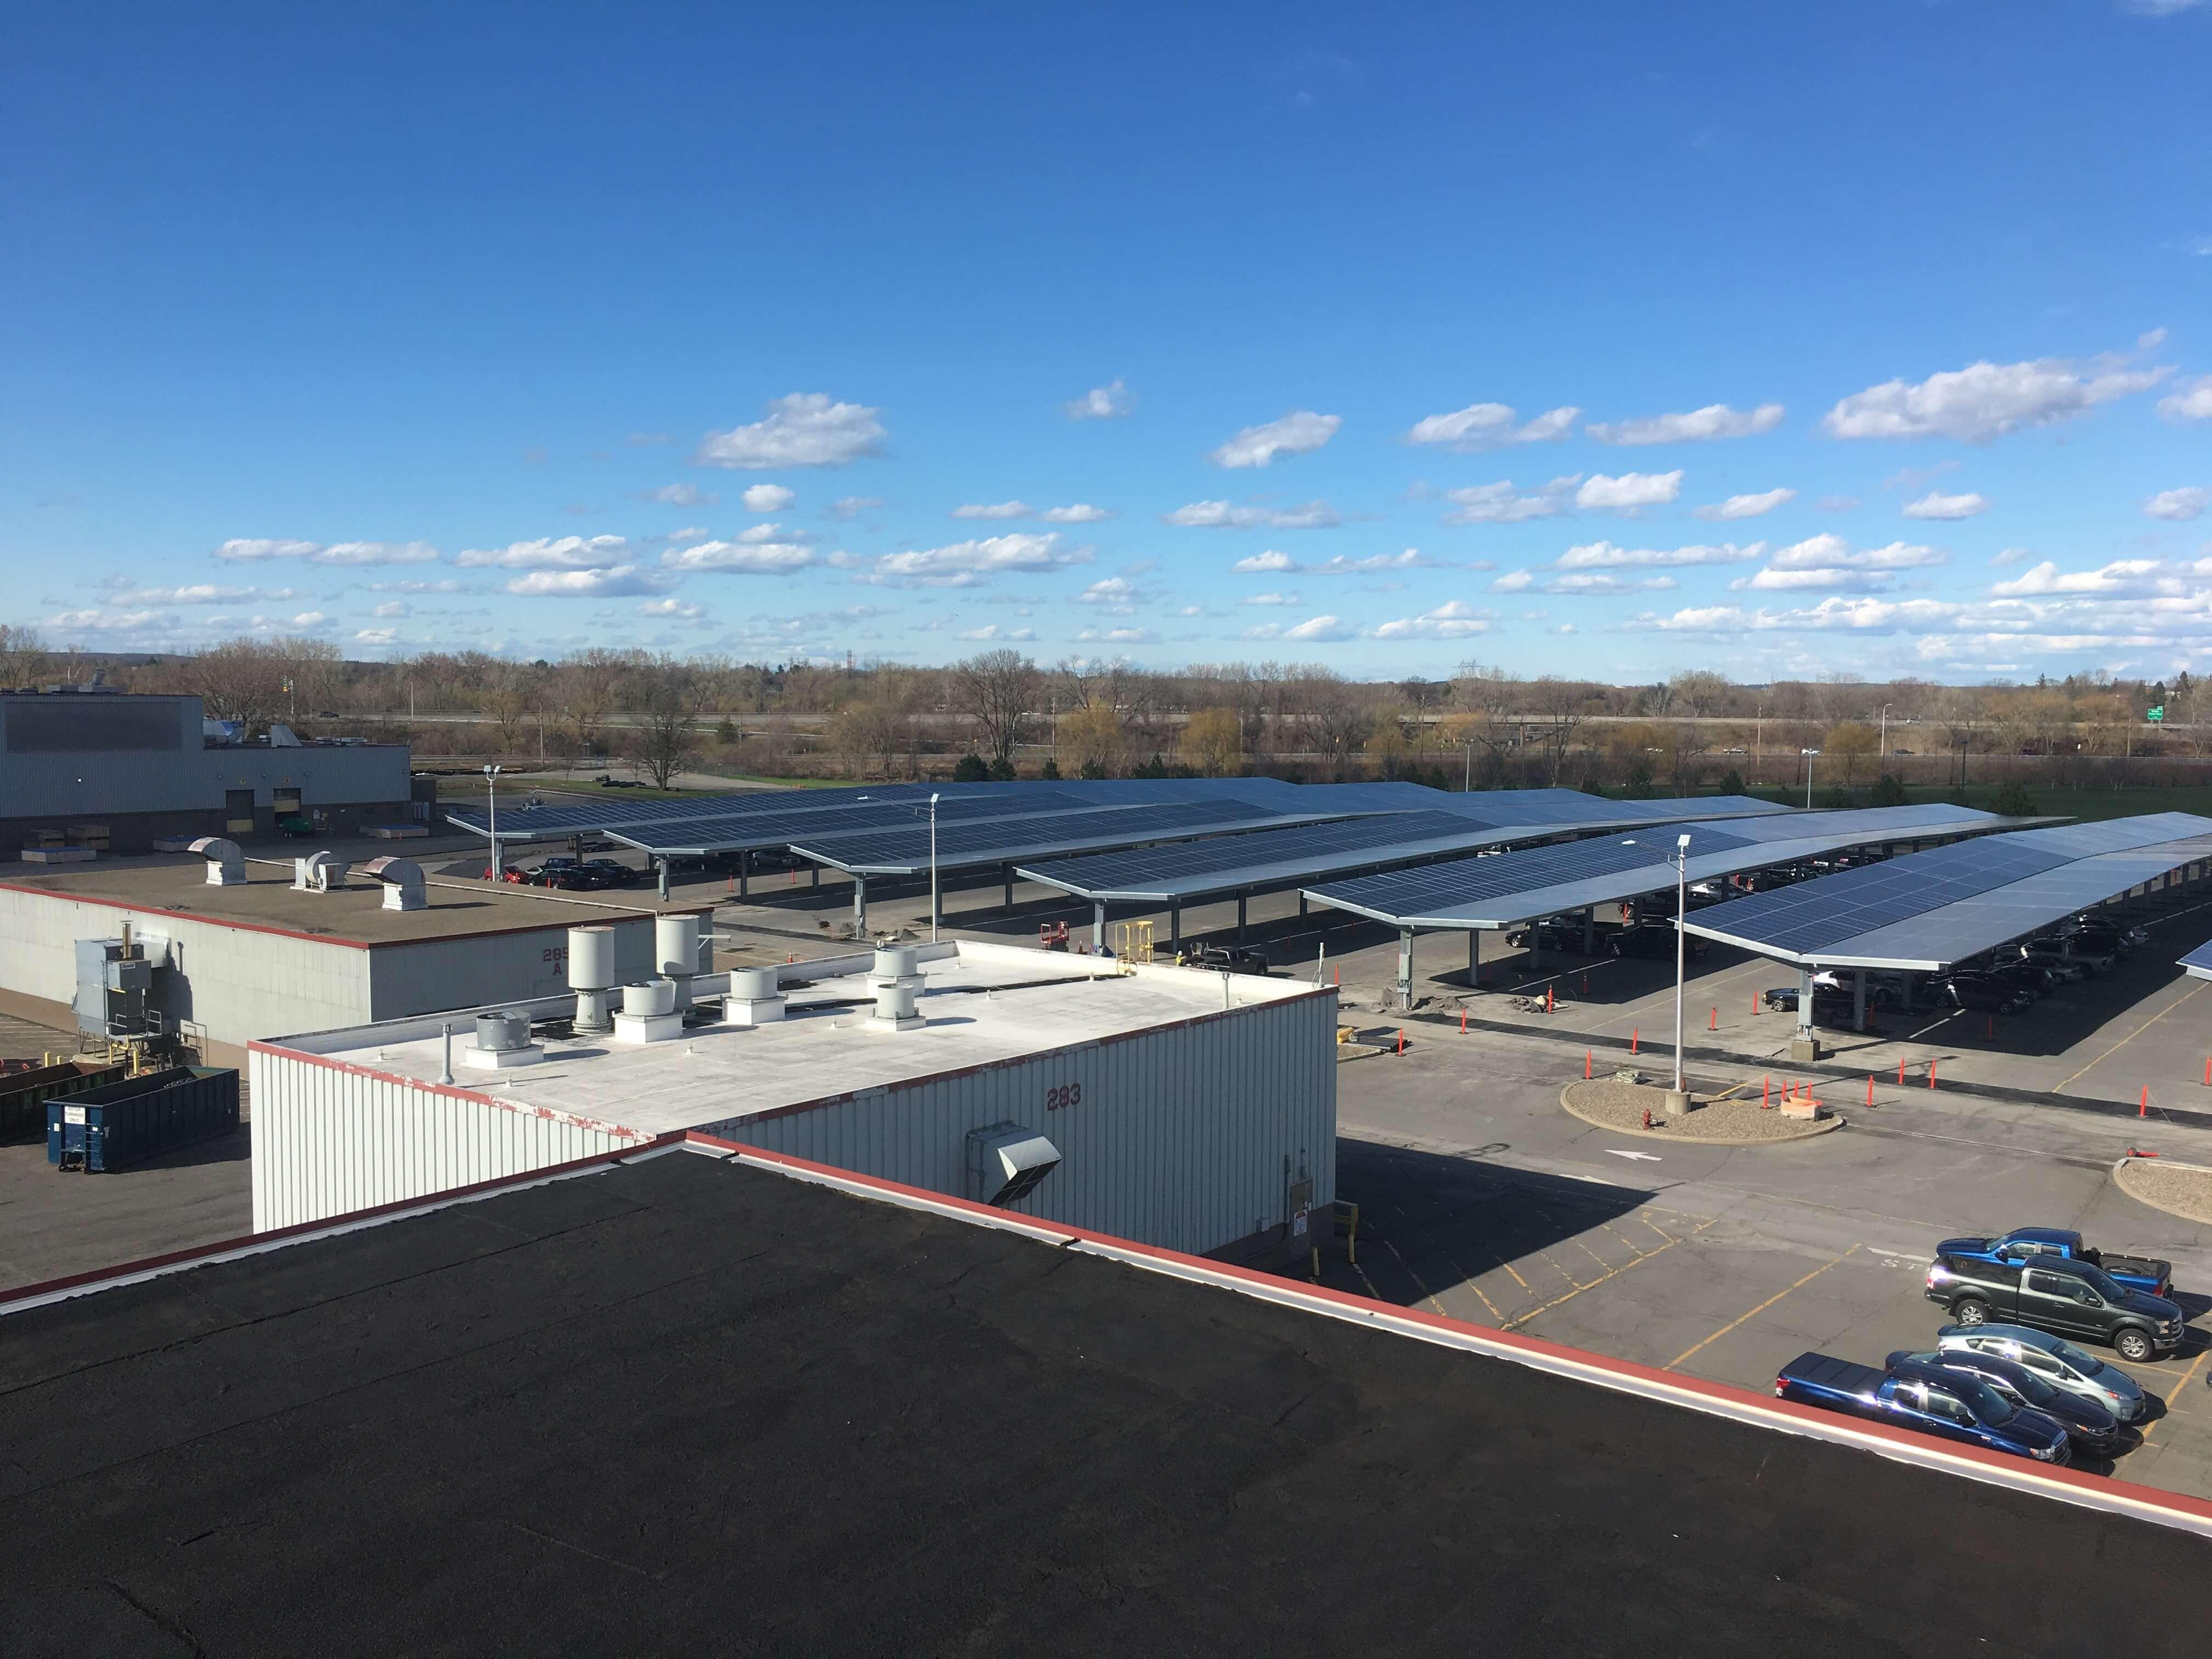 GE-1 GE Installs 2.26 MW Solar Carport At Upstate New York Campus